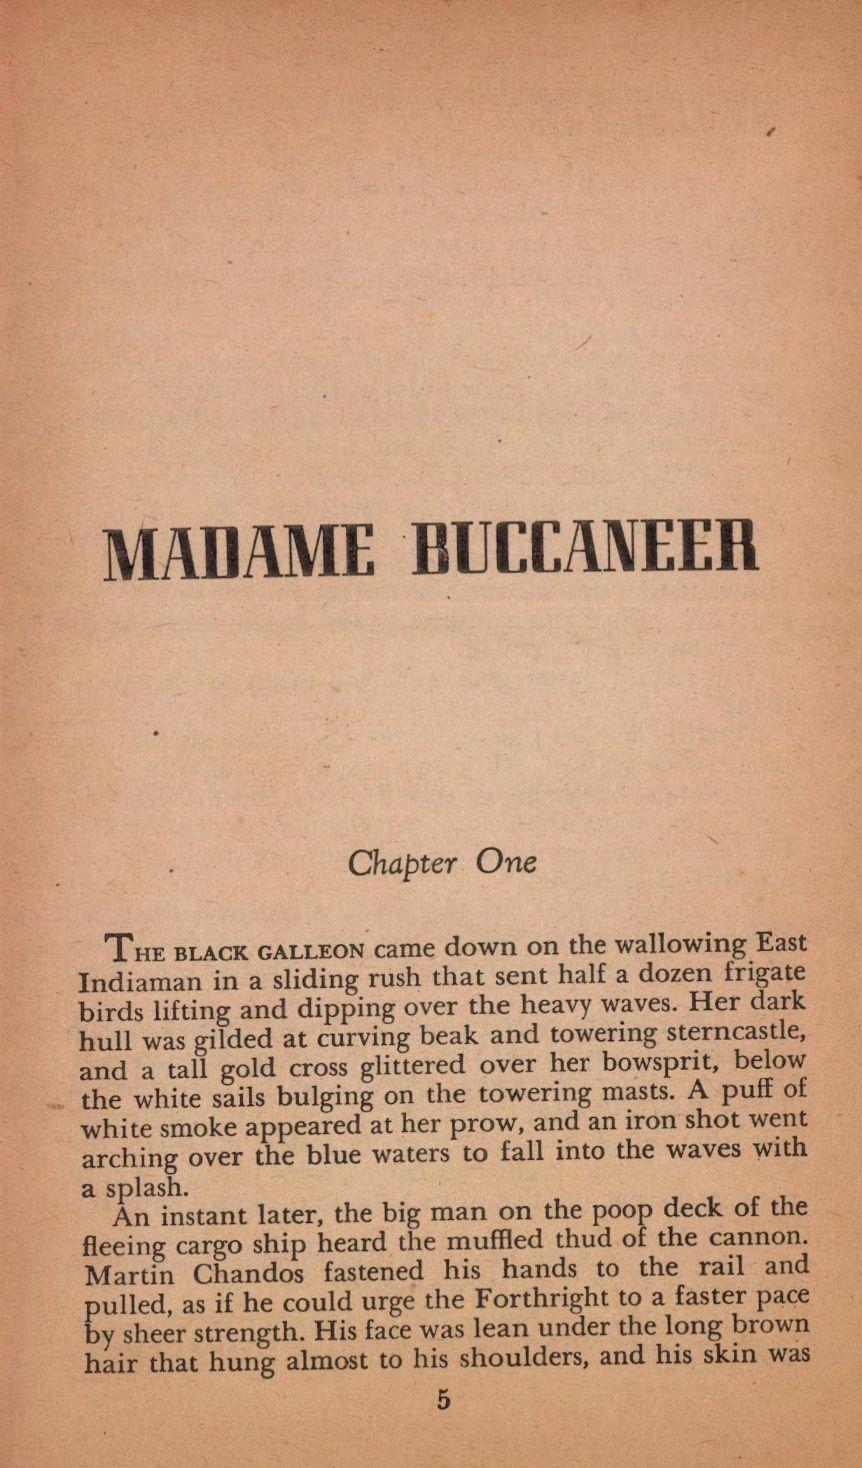 Madame Buccaneer Gardner F Fox 006.jpg